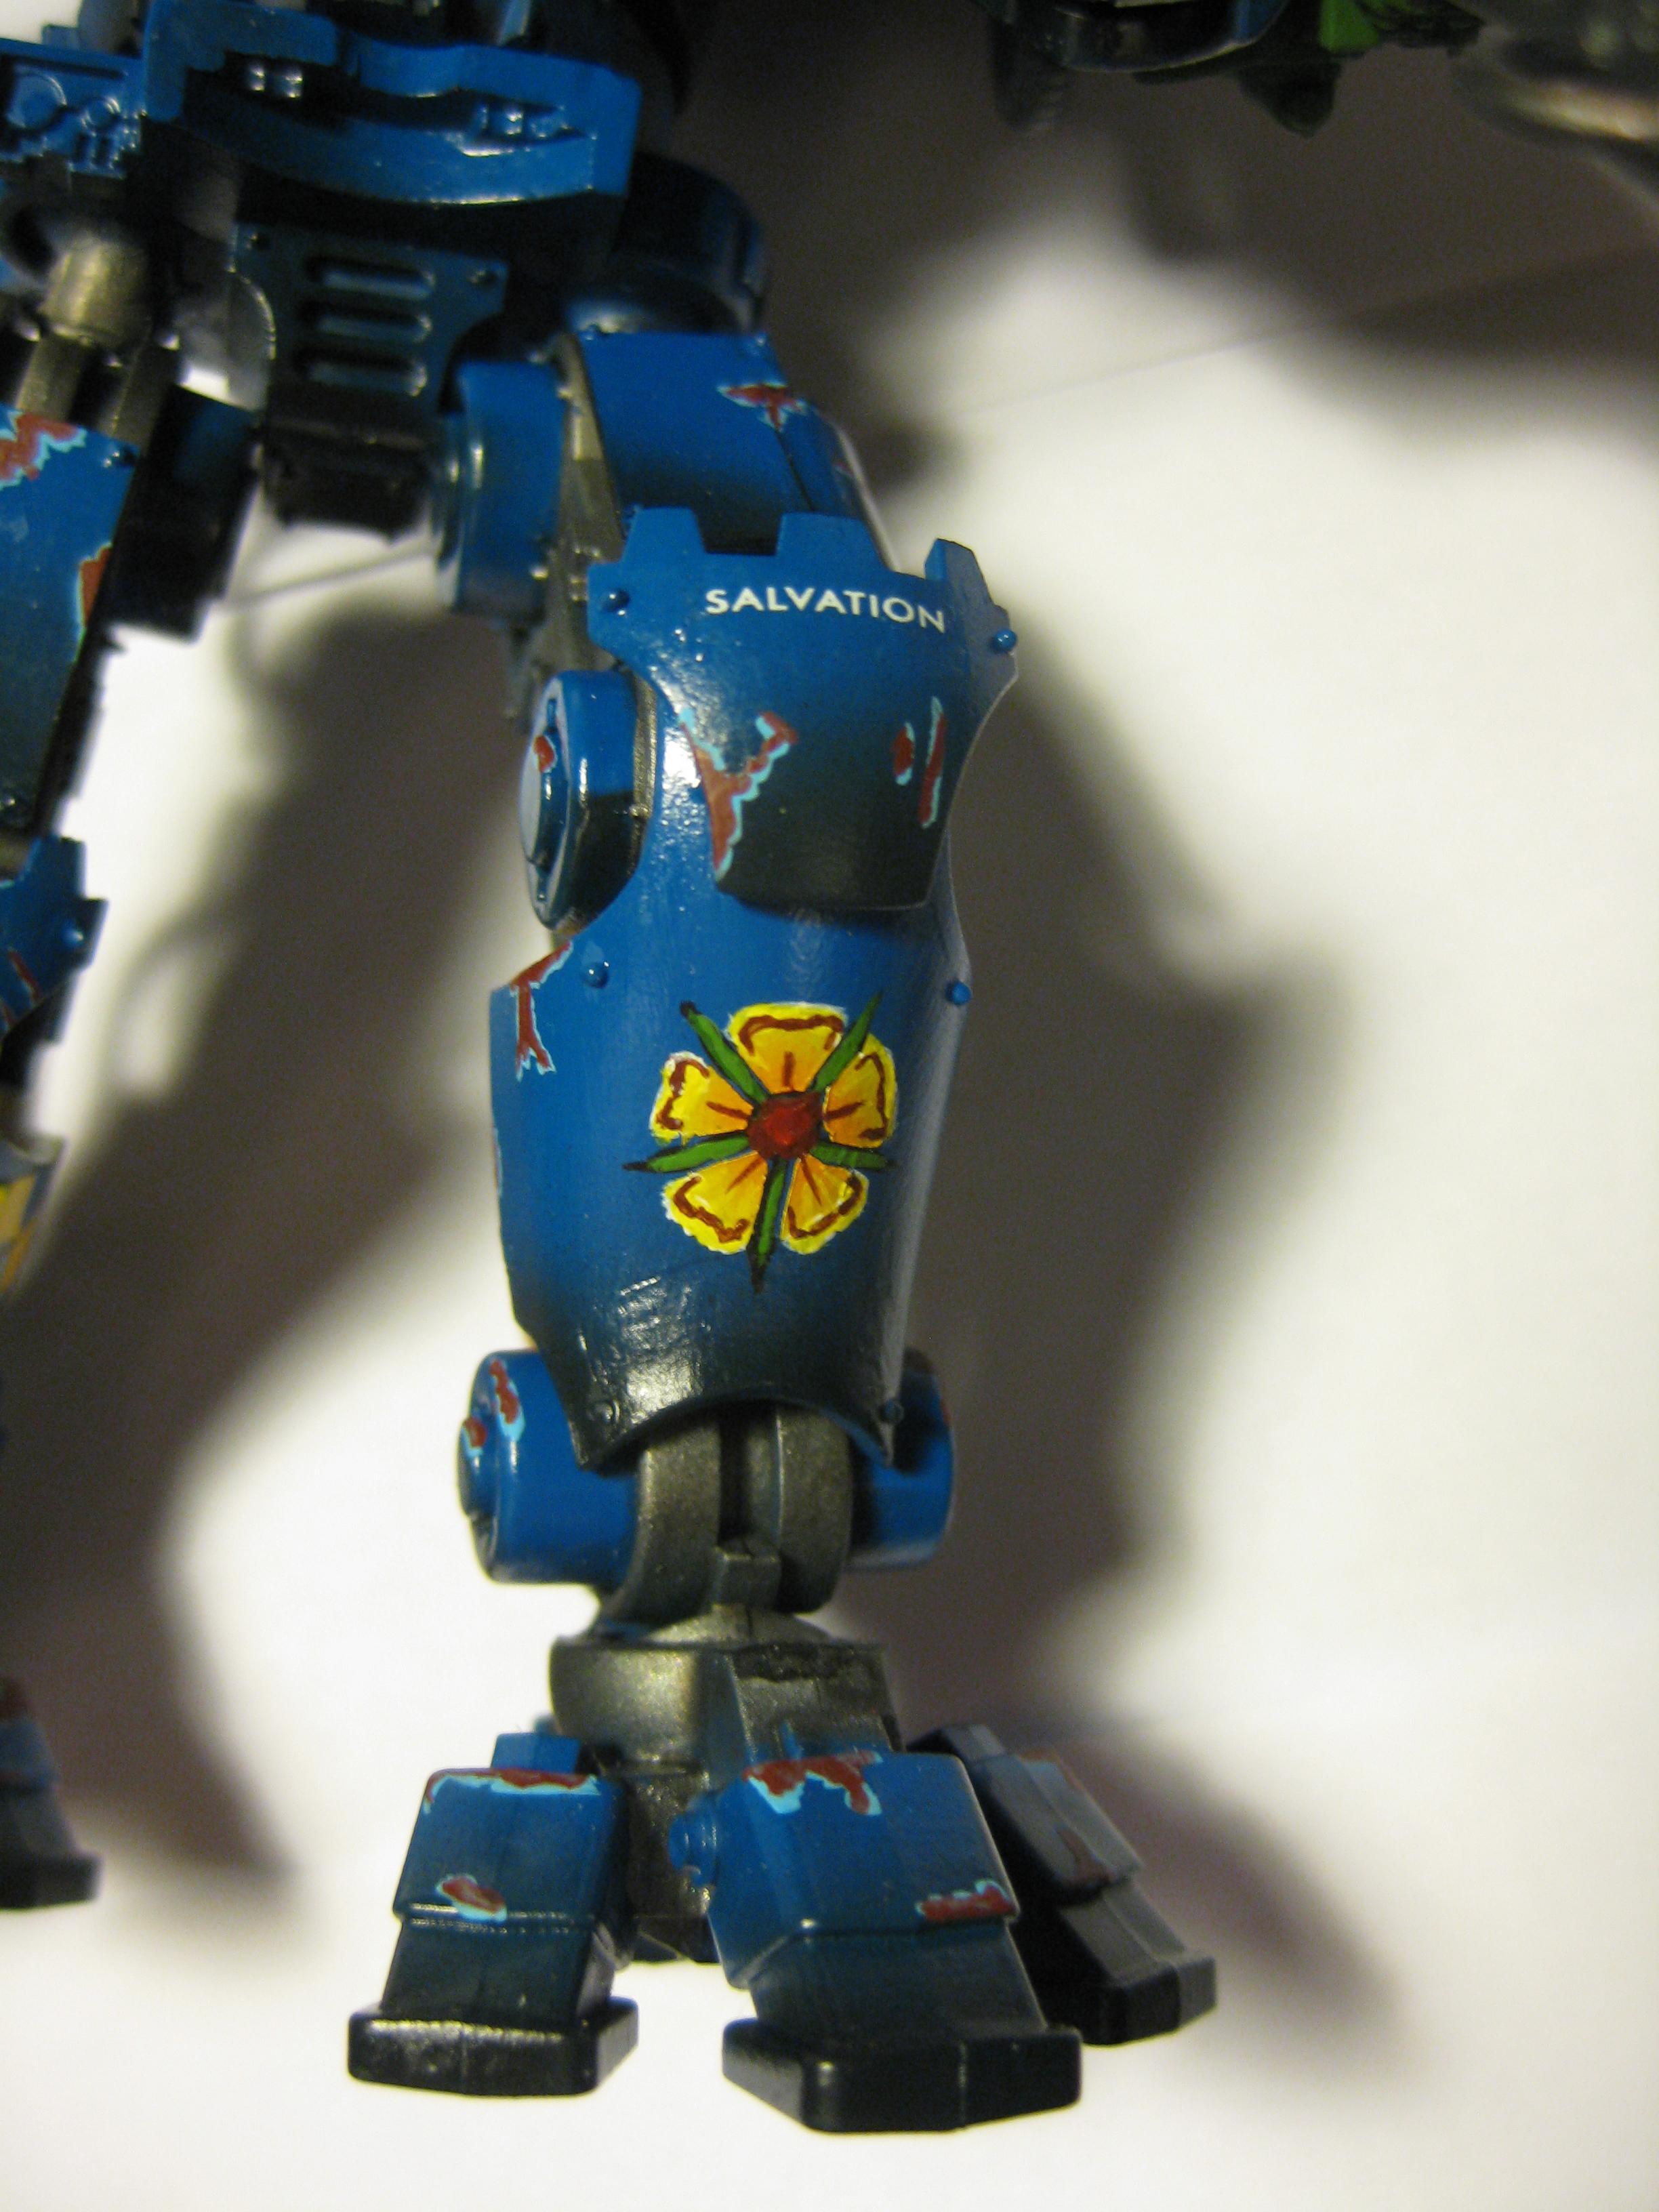 Adeptus Mechanicus, Airbrush, Blue, Chipping, Knights, Pip, Warhammer 40,000